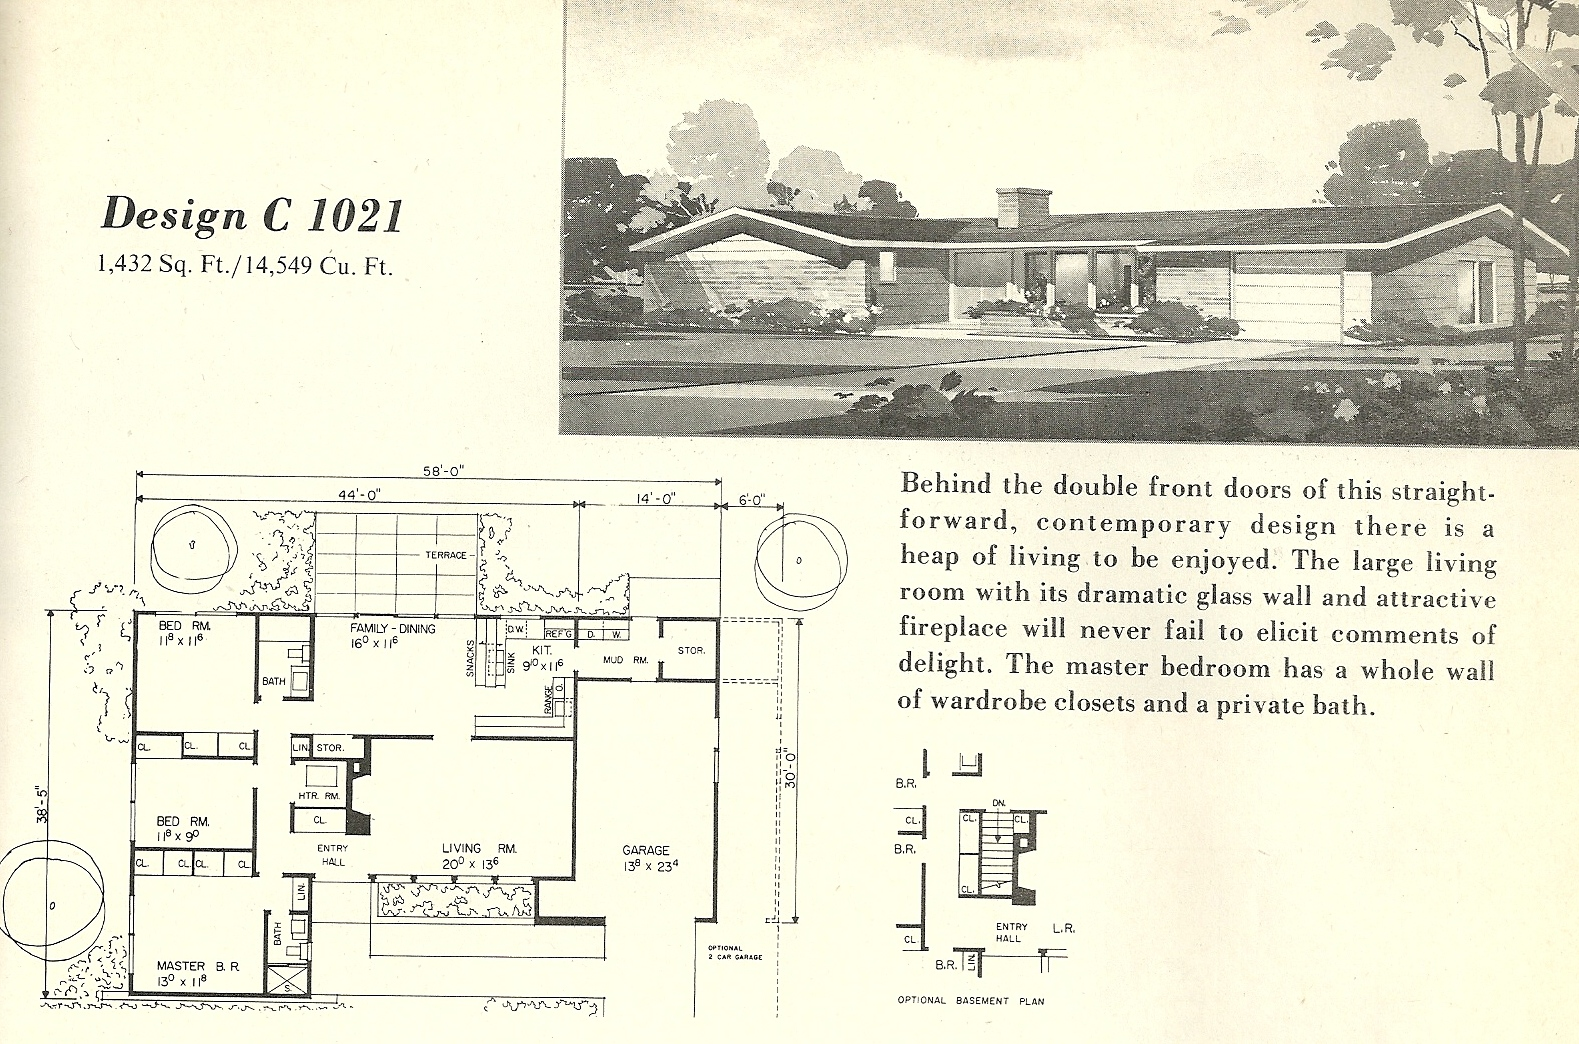 Vintage House Plans 1021